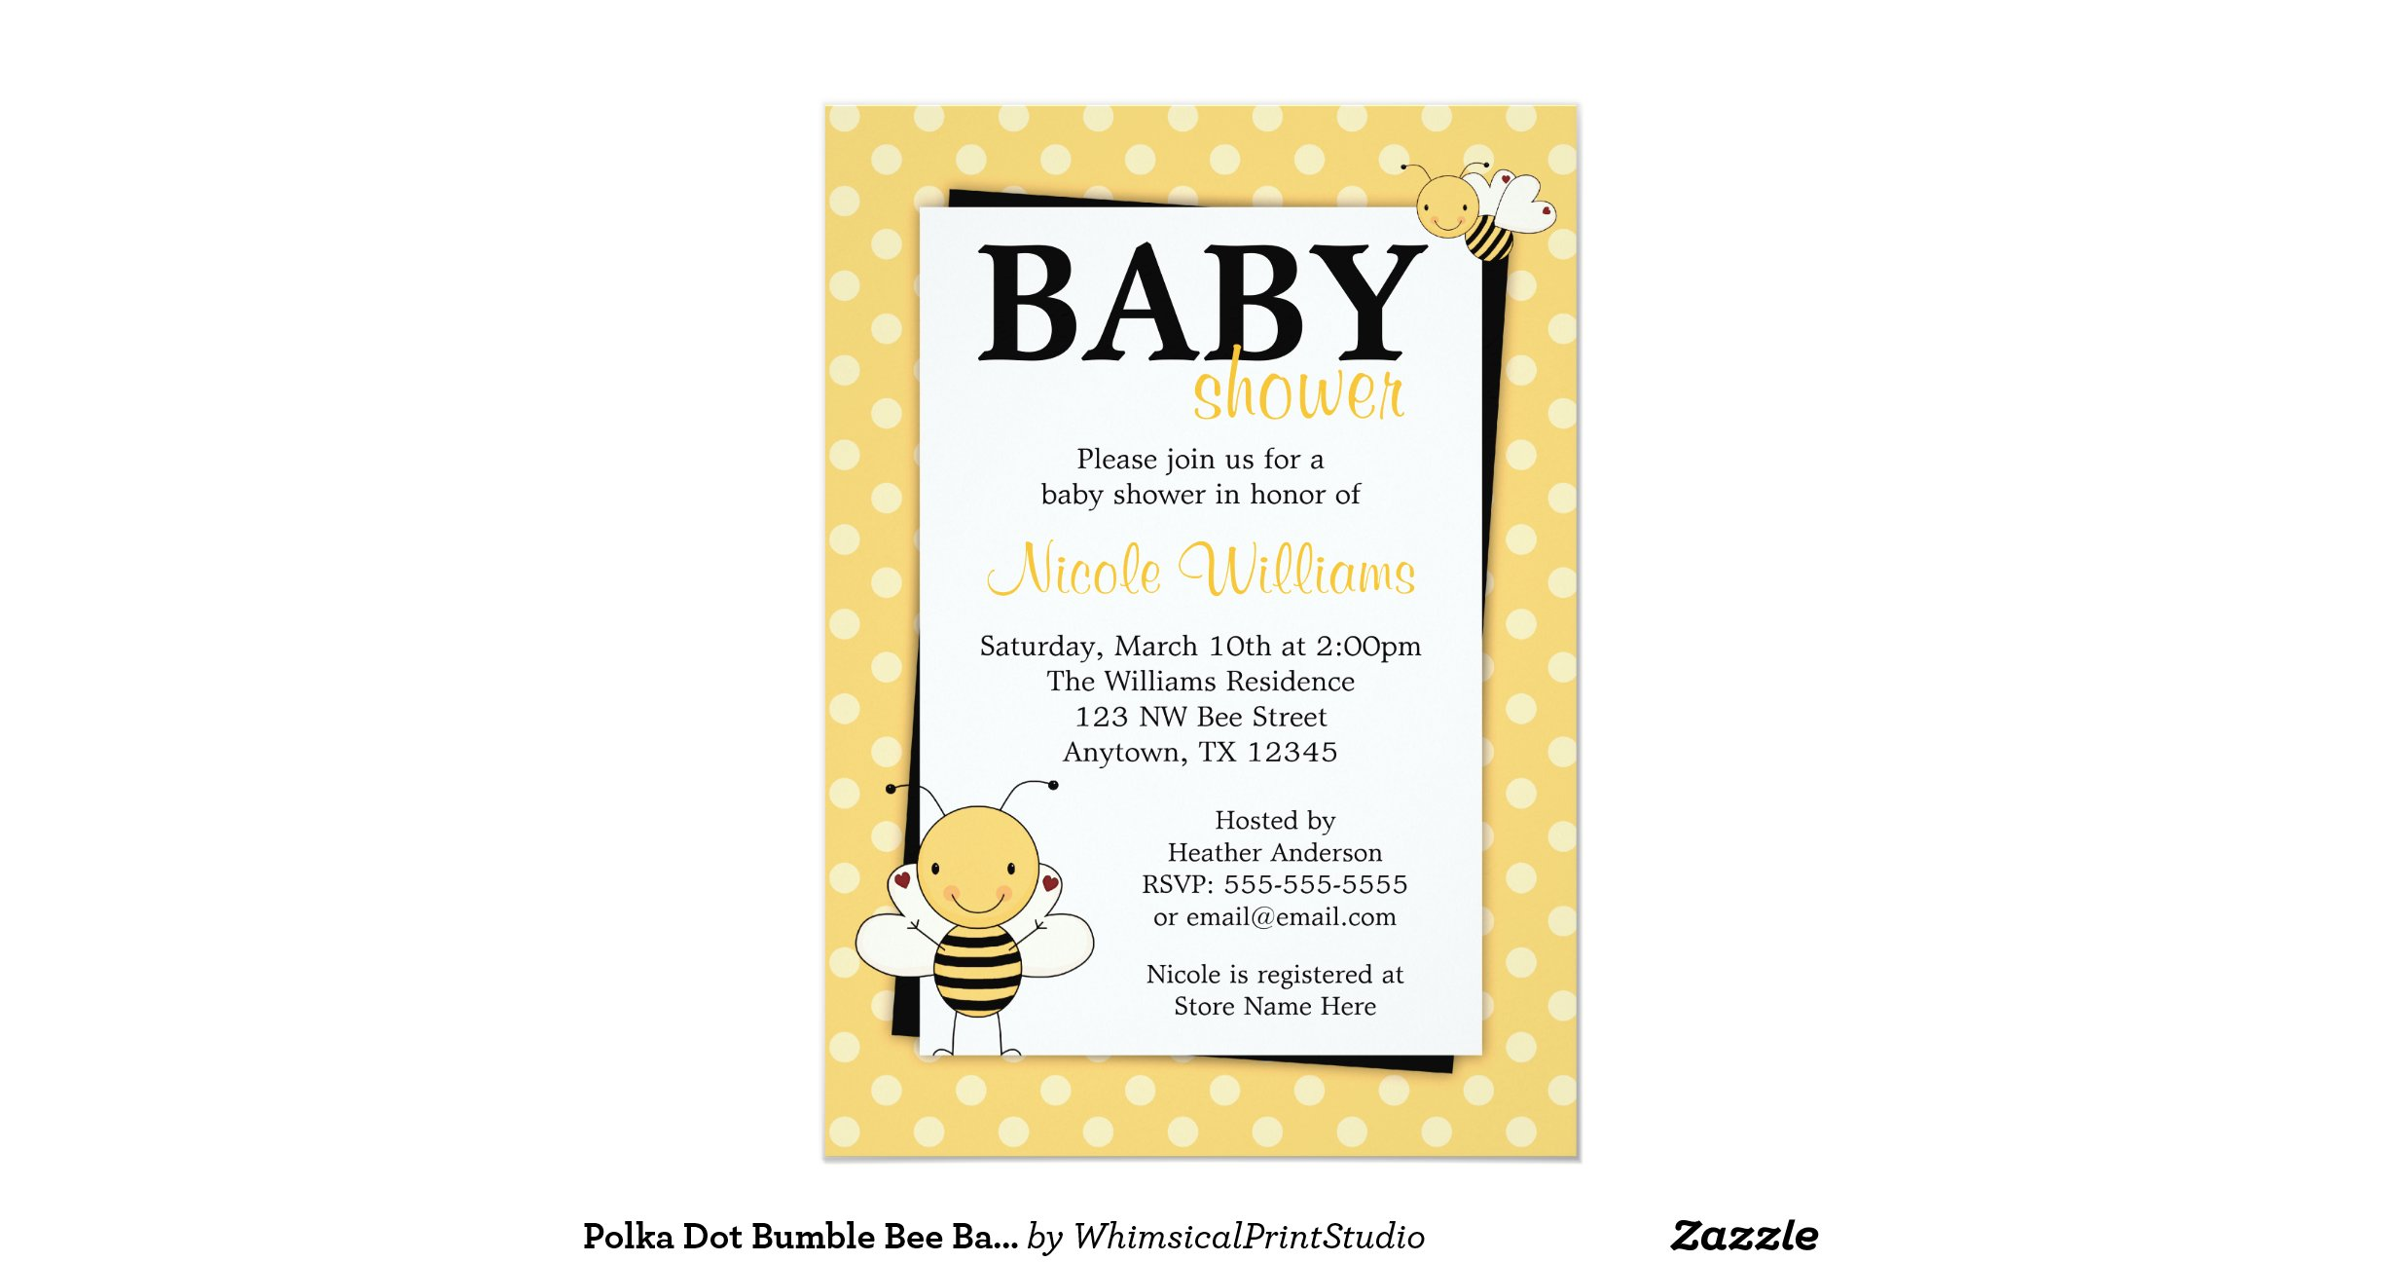 polka dot bumble bee baby shower invitations